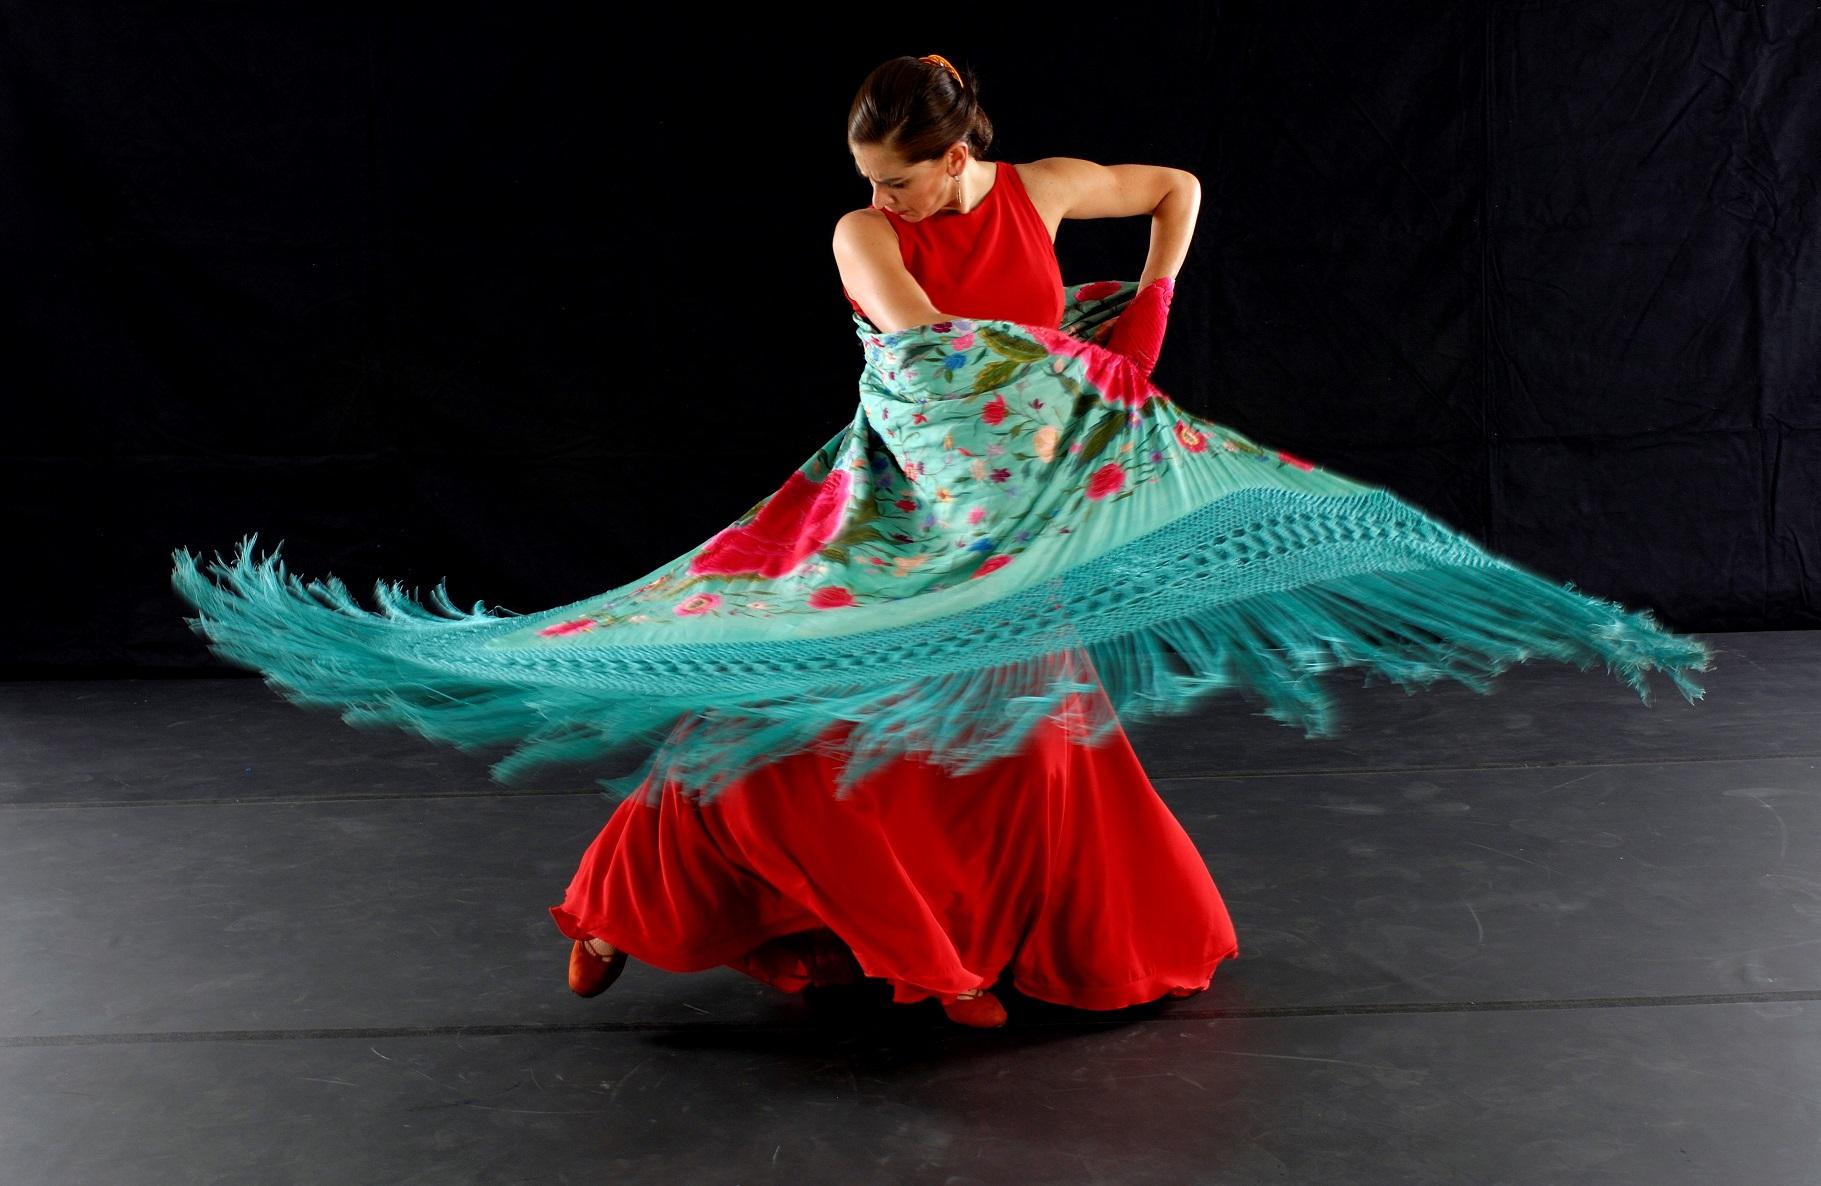 Theatre_Flamenco_Image_6_Cropped.jpg